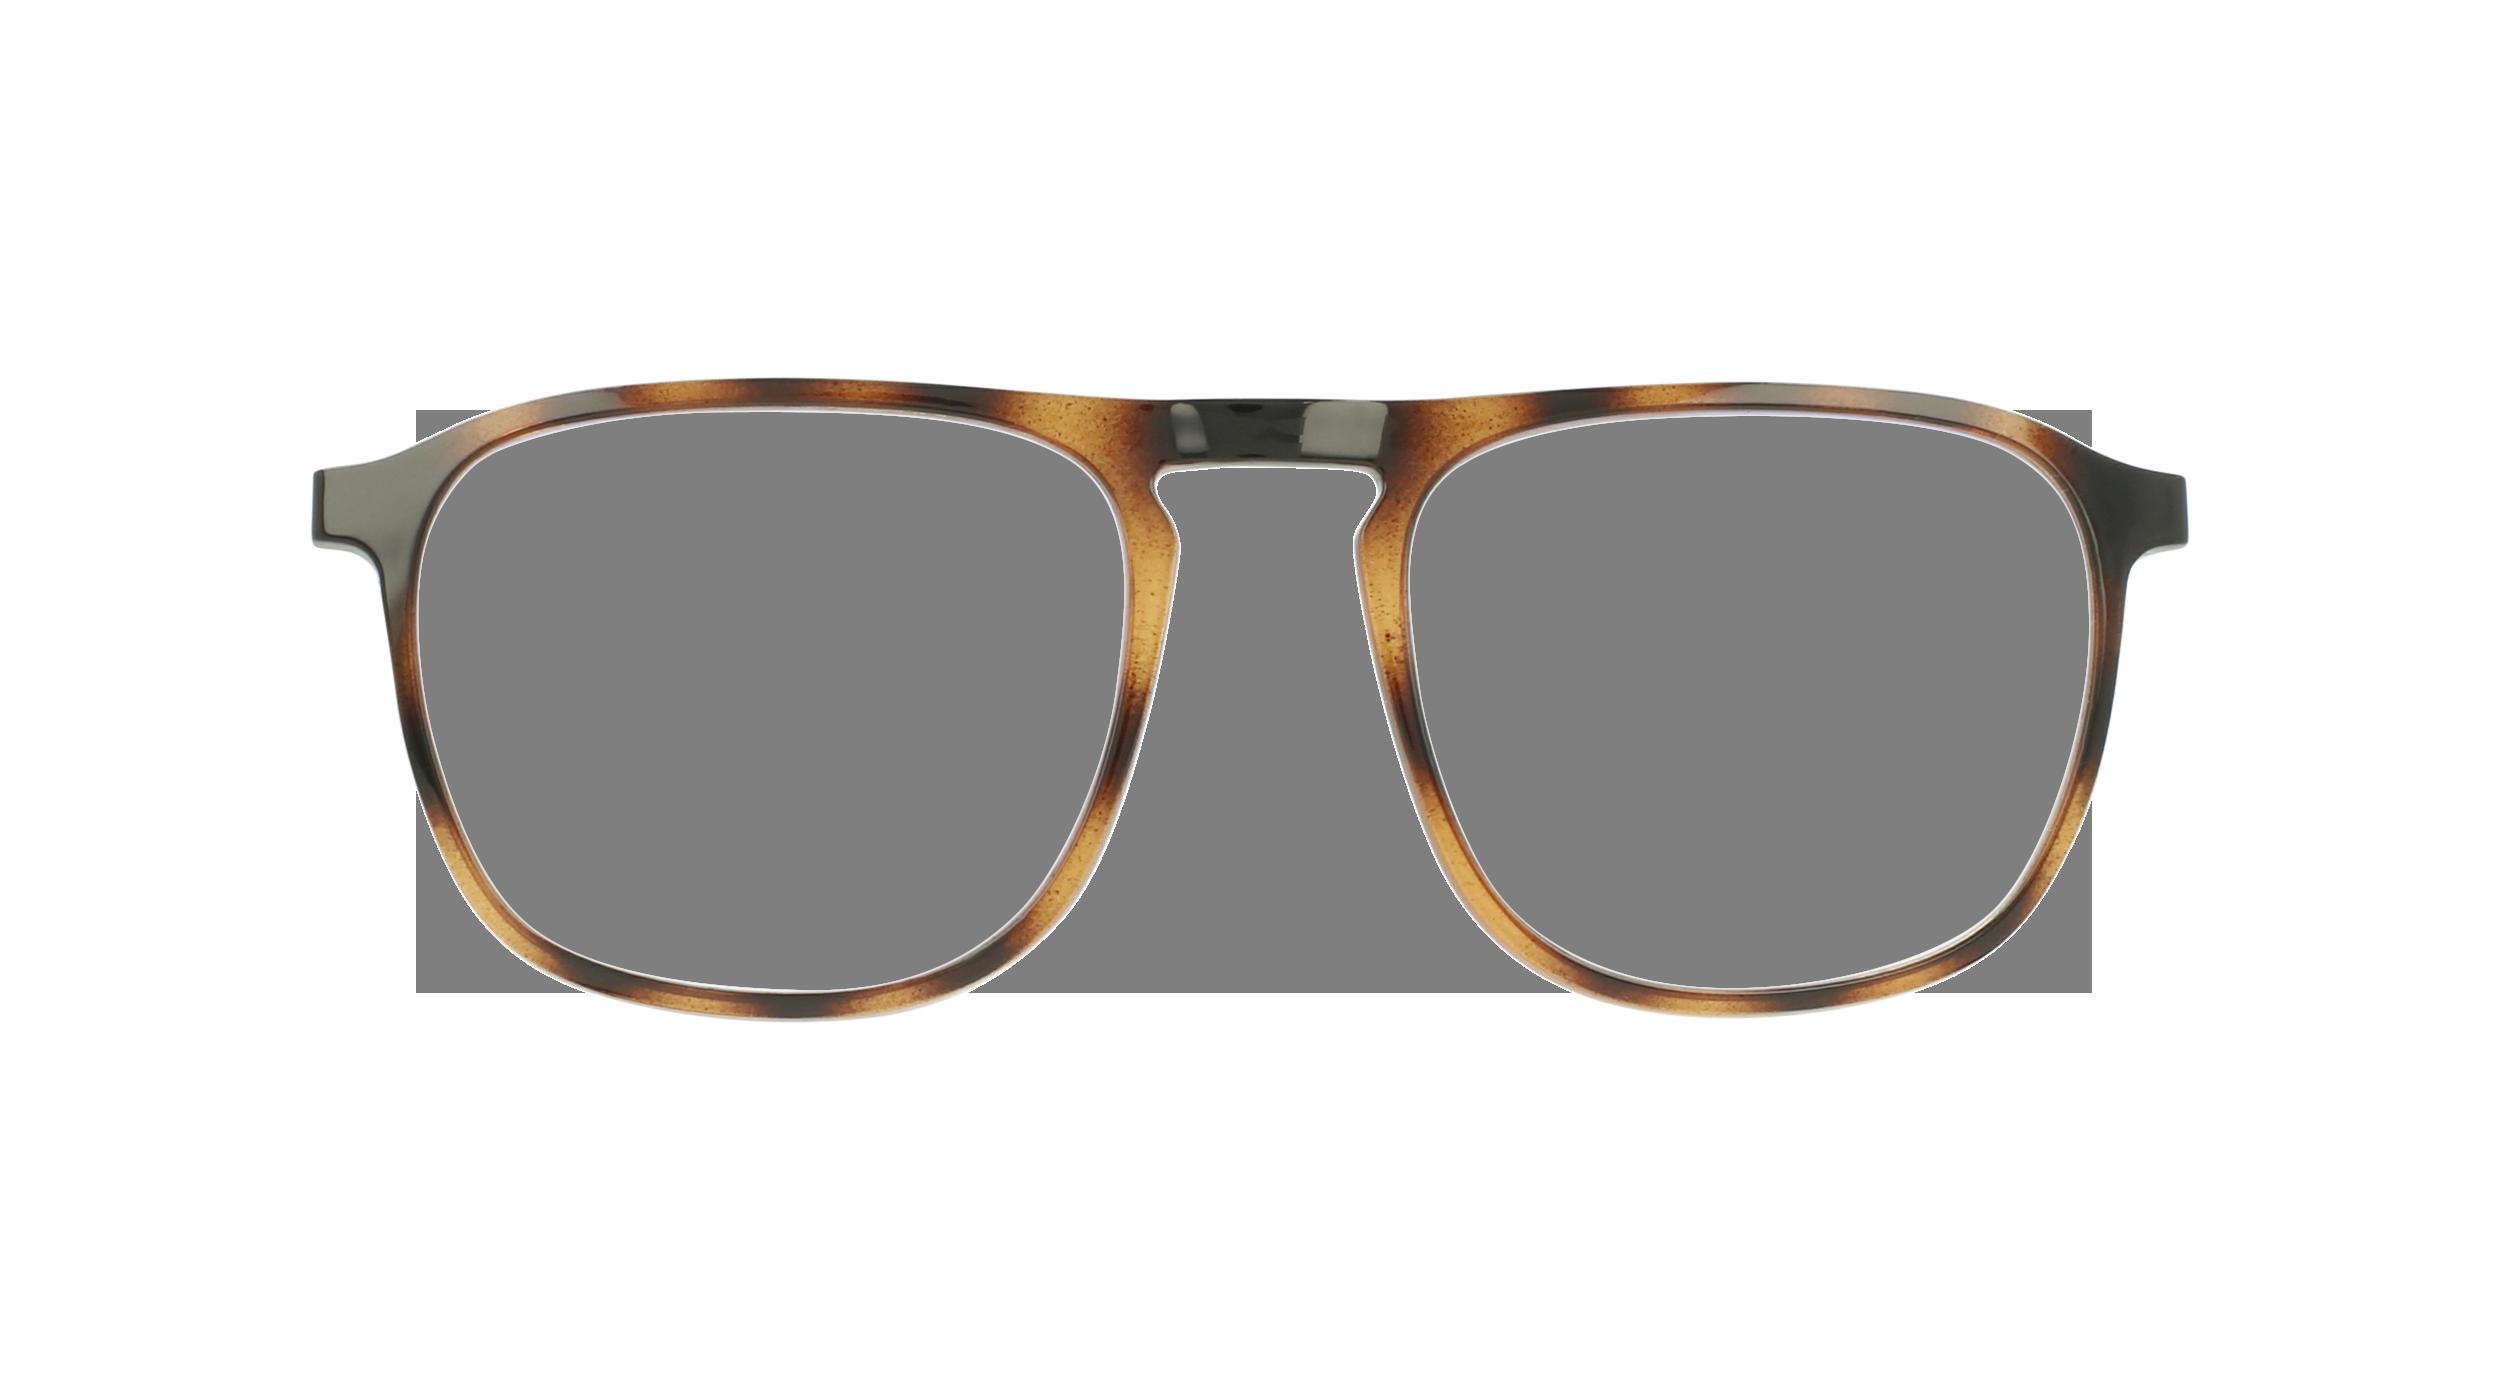 afflelou/france/products/smart_clip/clips_glasses/07630036457245.png